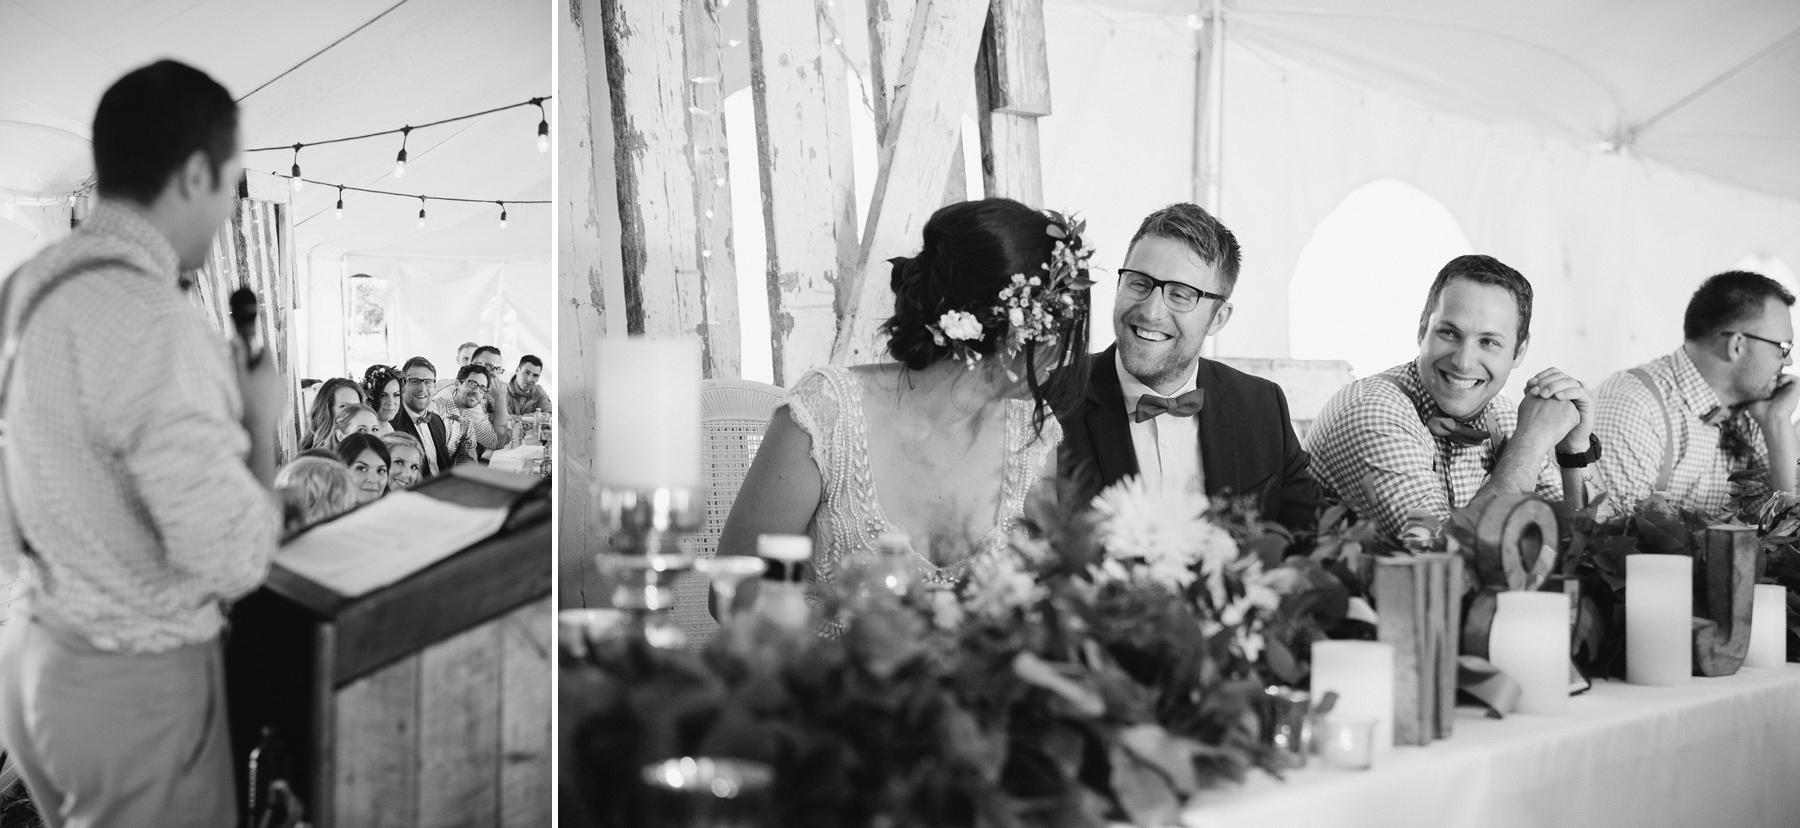 alberta-farm-wedding-photographer-rp-wj-195.jpg